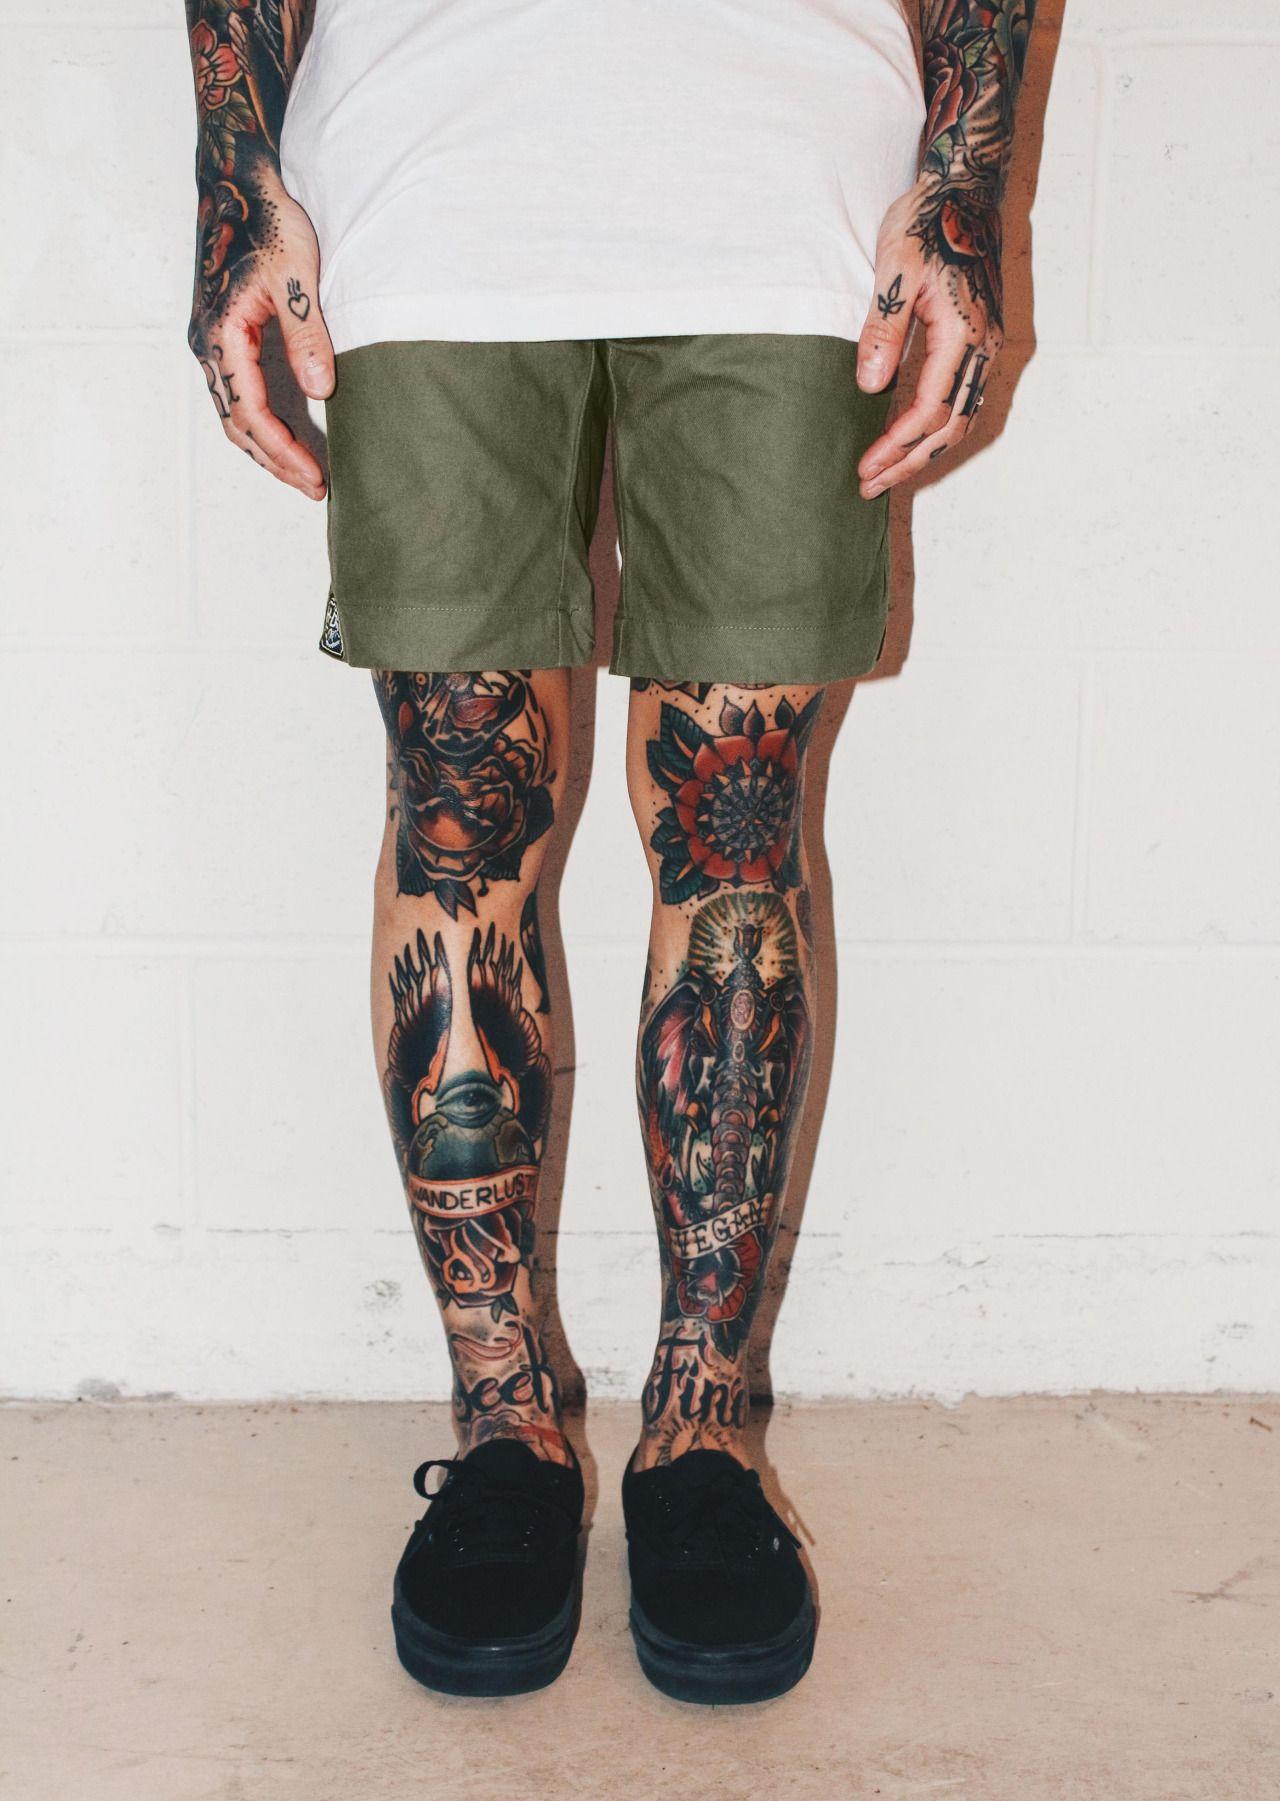 Olive signature shorts created to fit to perfection www hrdrvs com tattoo legsleg tattoosleg sleeve tattooankle